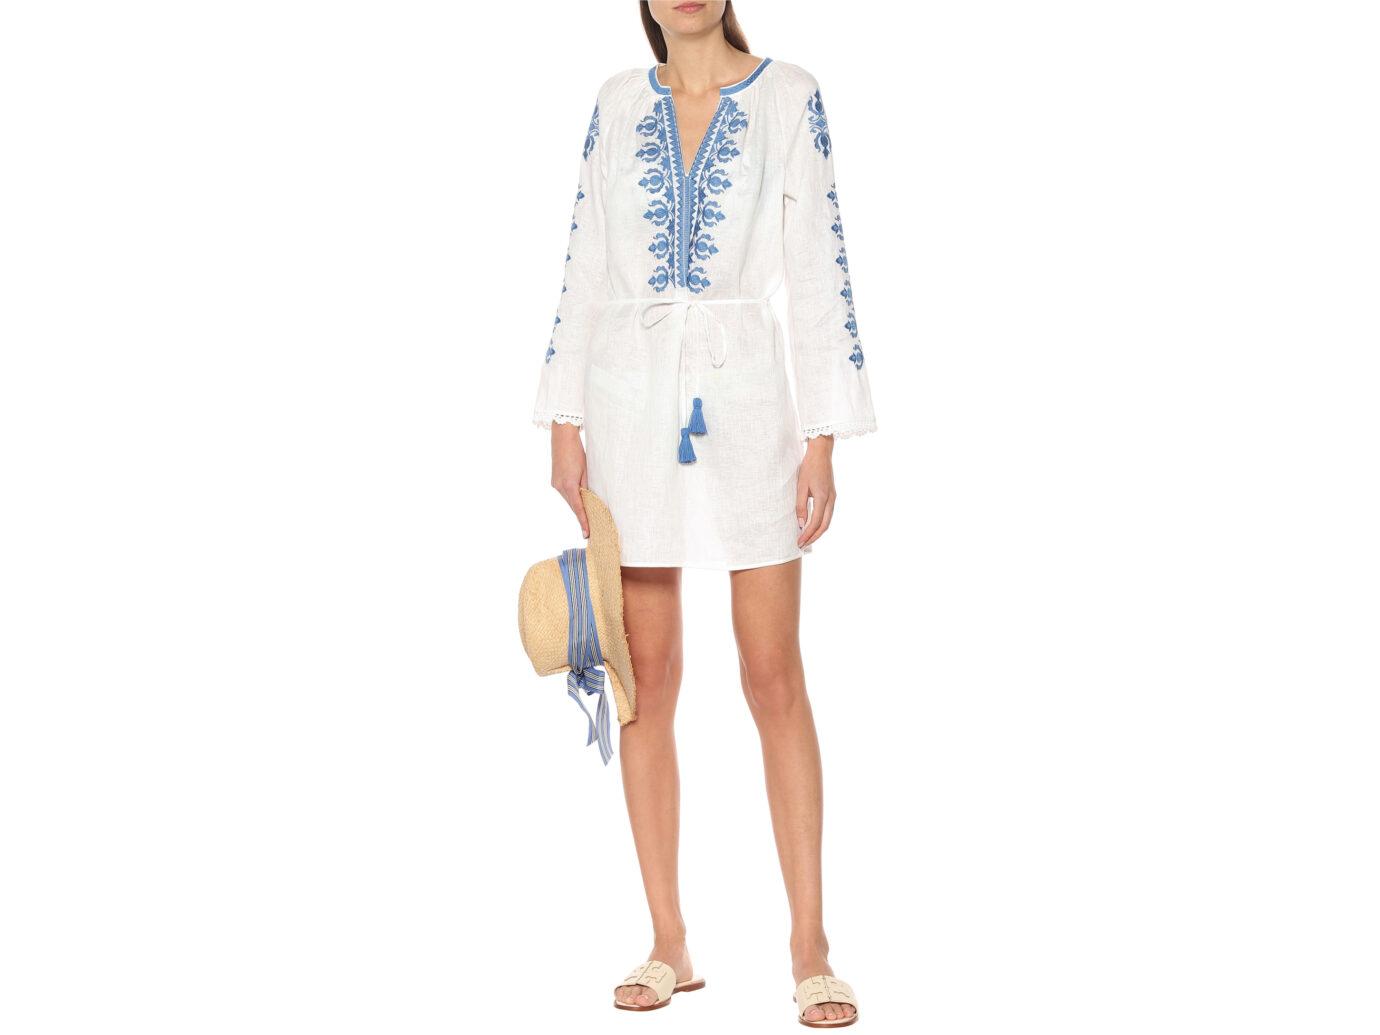 Tory Burch Embroidered Linen Mini Dress